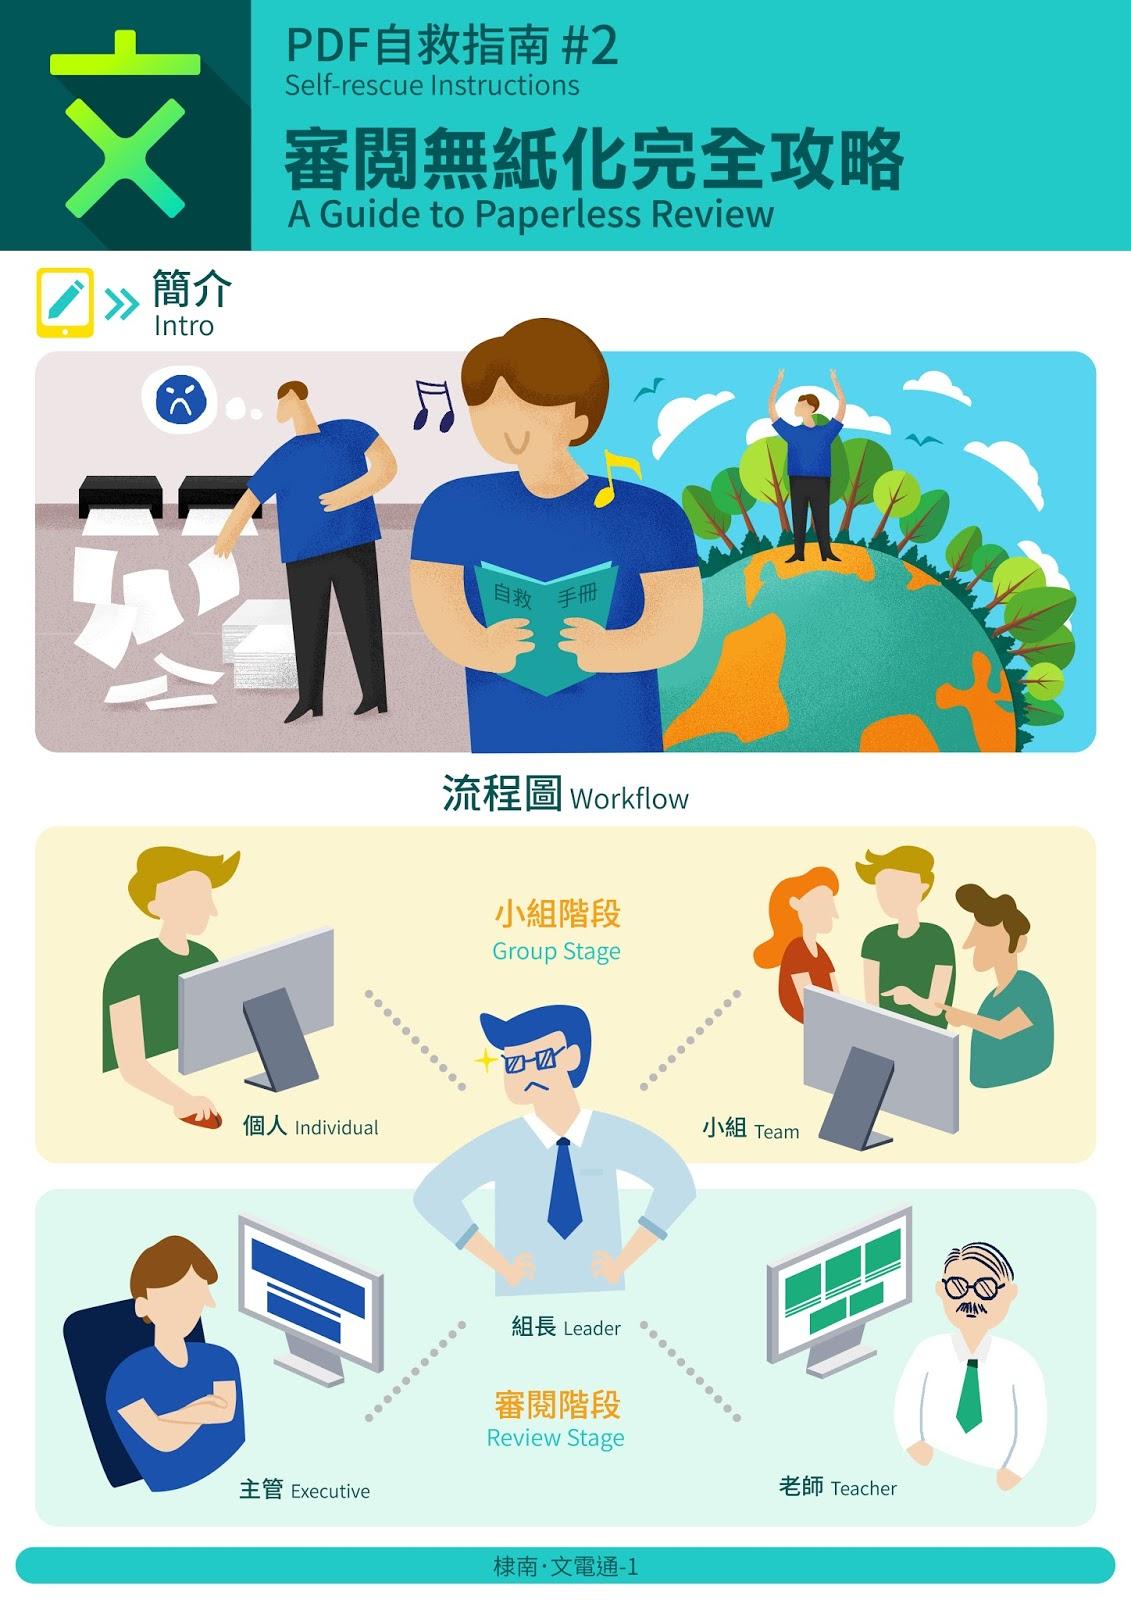 PDF審閱無紙化